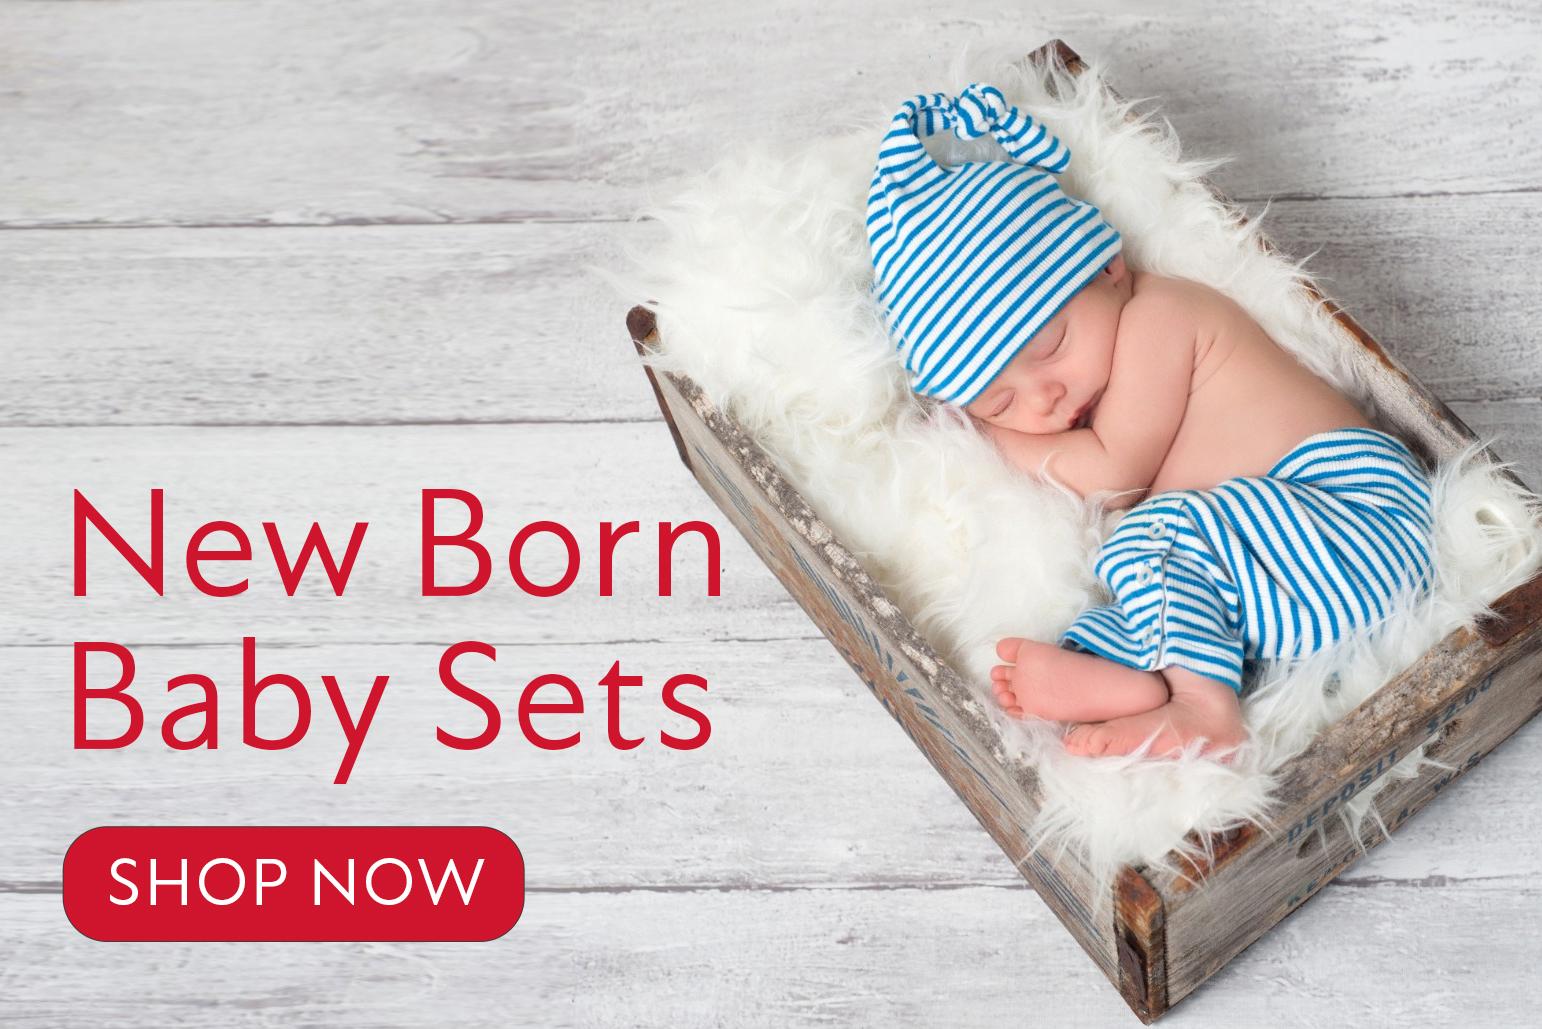 New Born Baby Sets